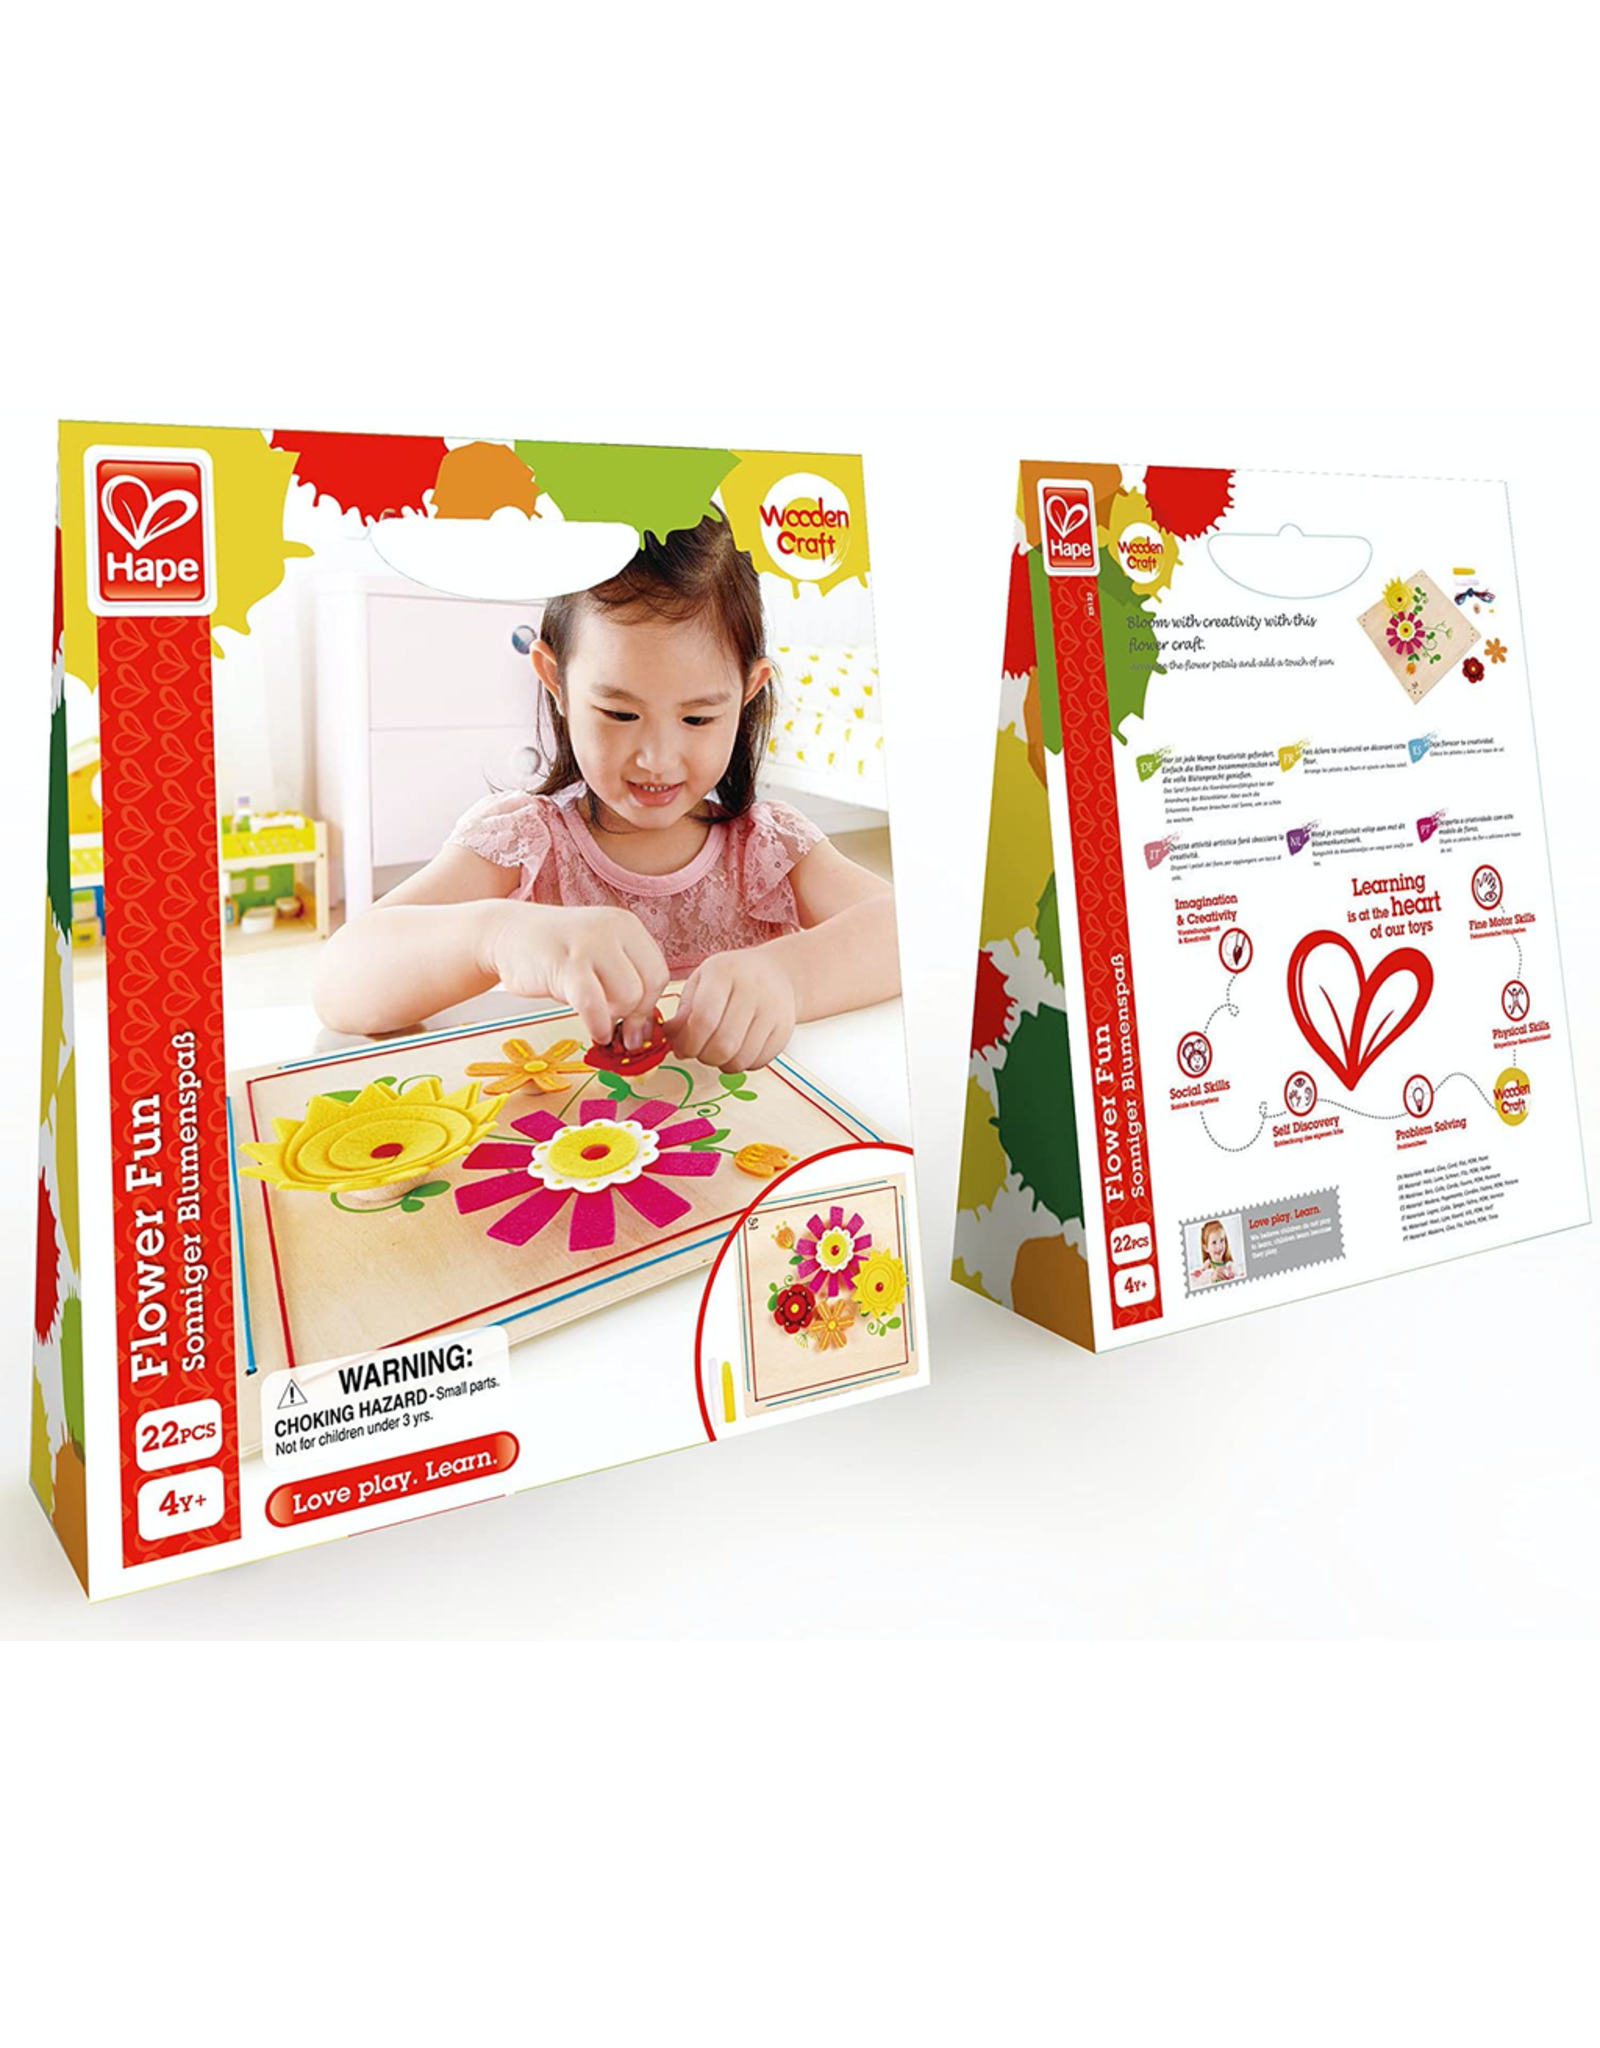 Hape FLOWER FUN WOODEN KID'S ARTS AND CRAFT KIT